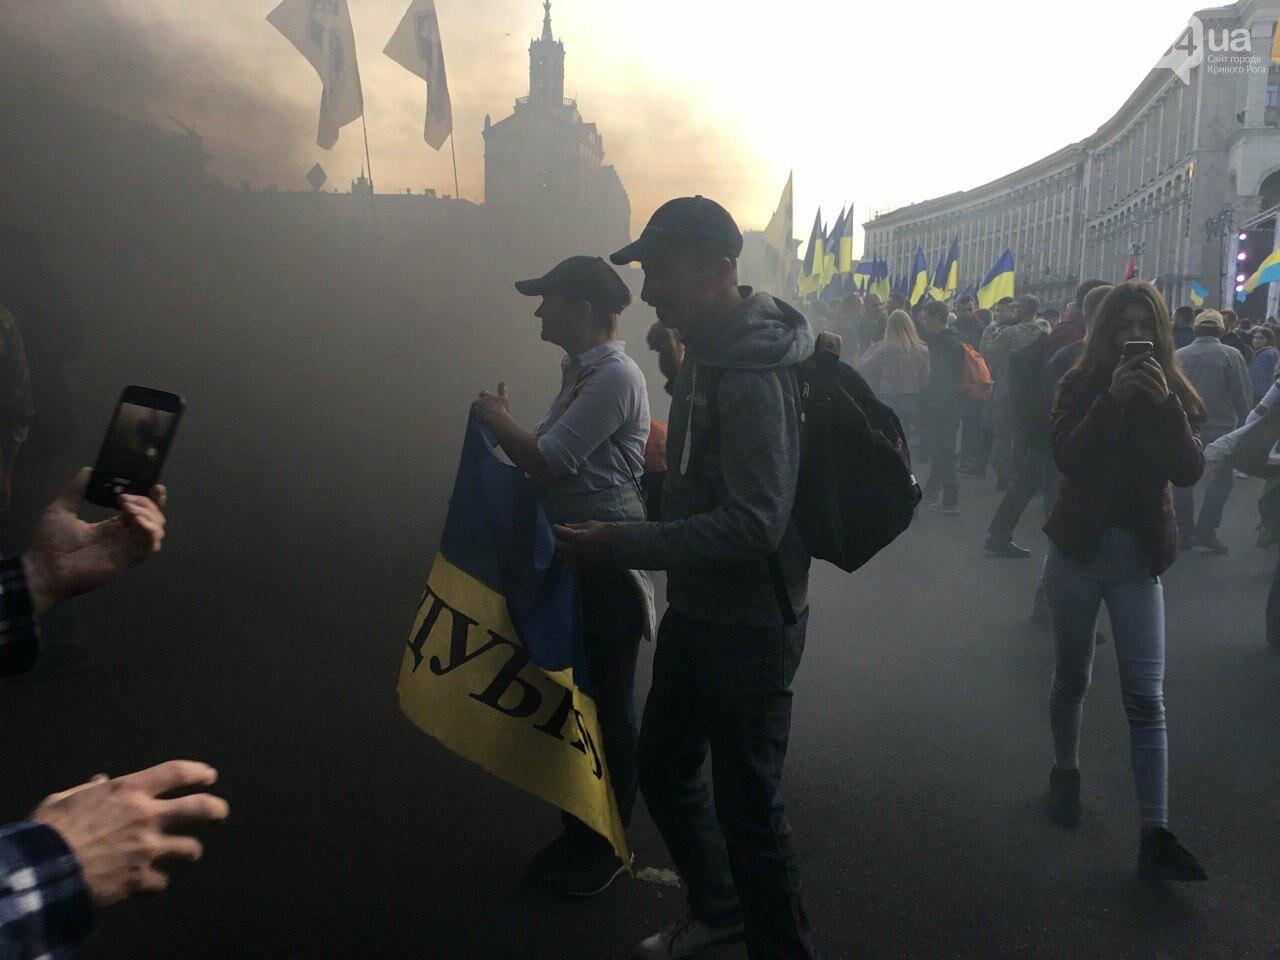 Криворожане поддержали Марш сопротивления капитуляции в Киеве, - ФОТО, ВИДЕО, ОБНОВЛЕНО, фото-33